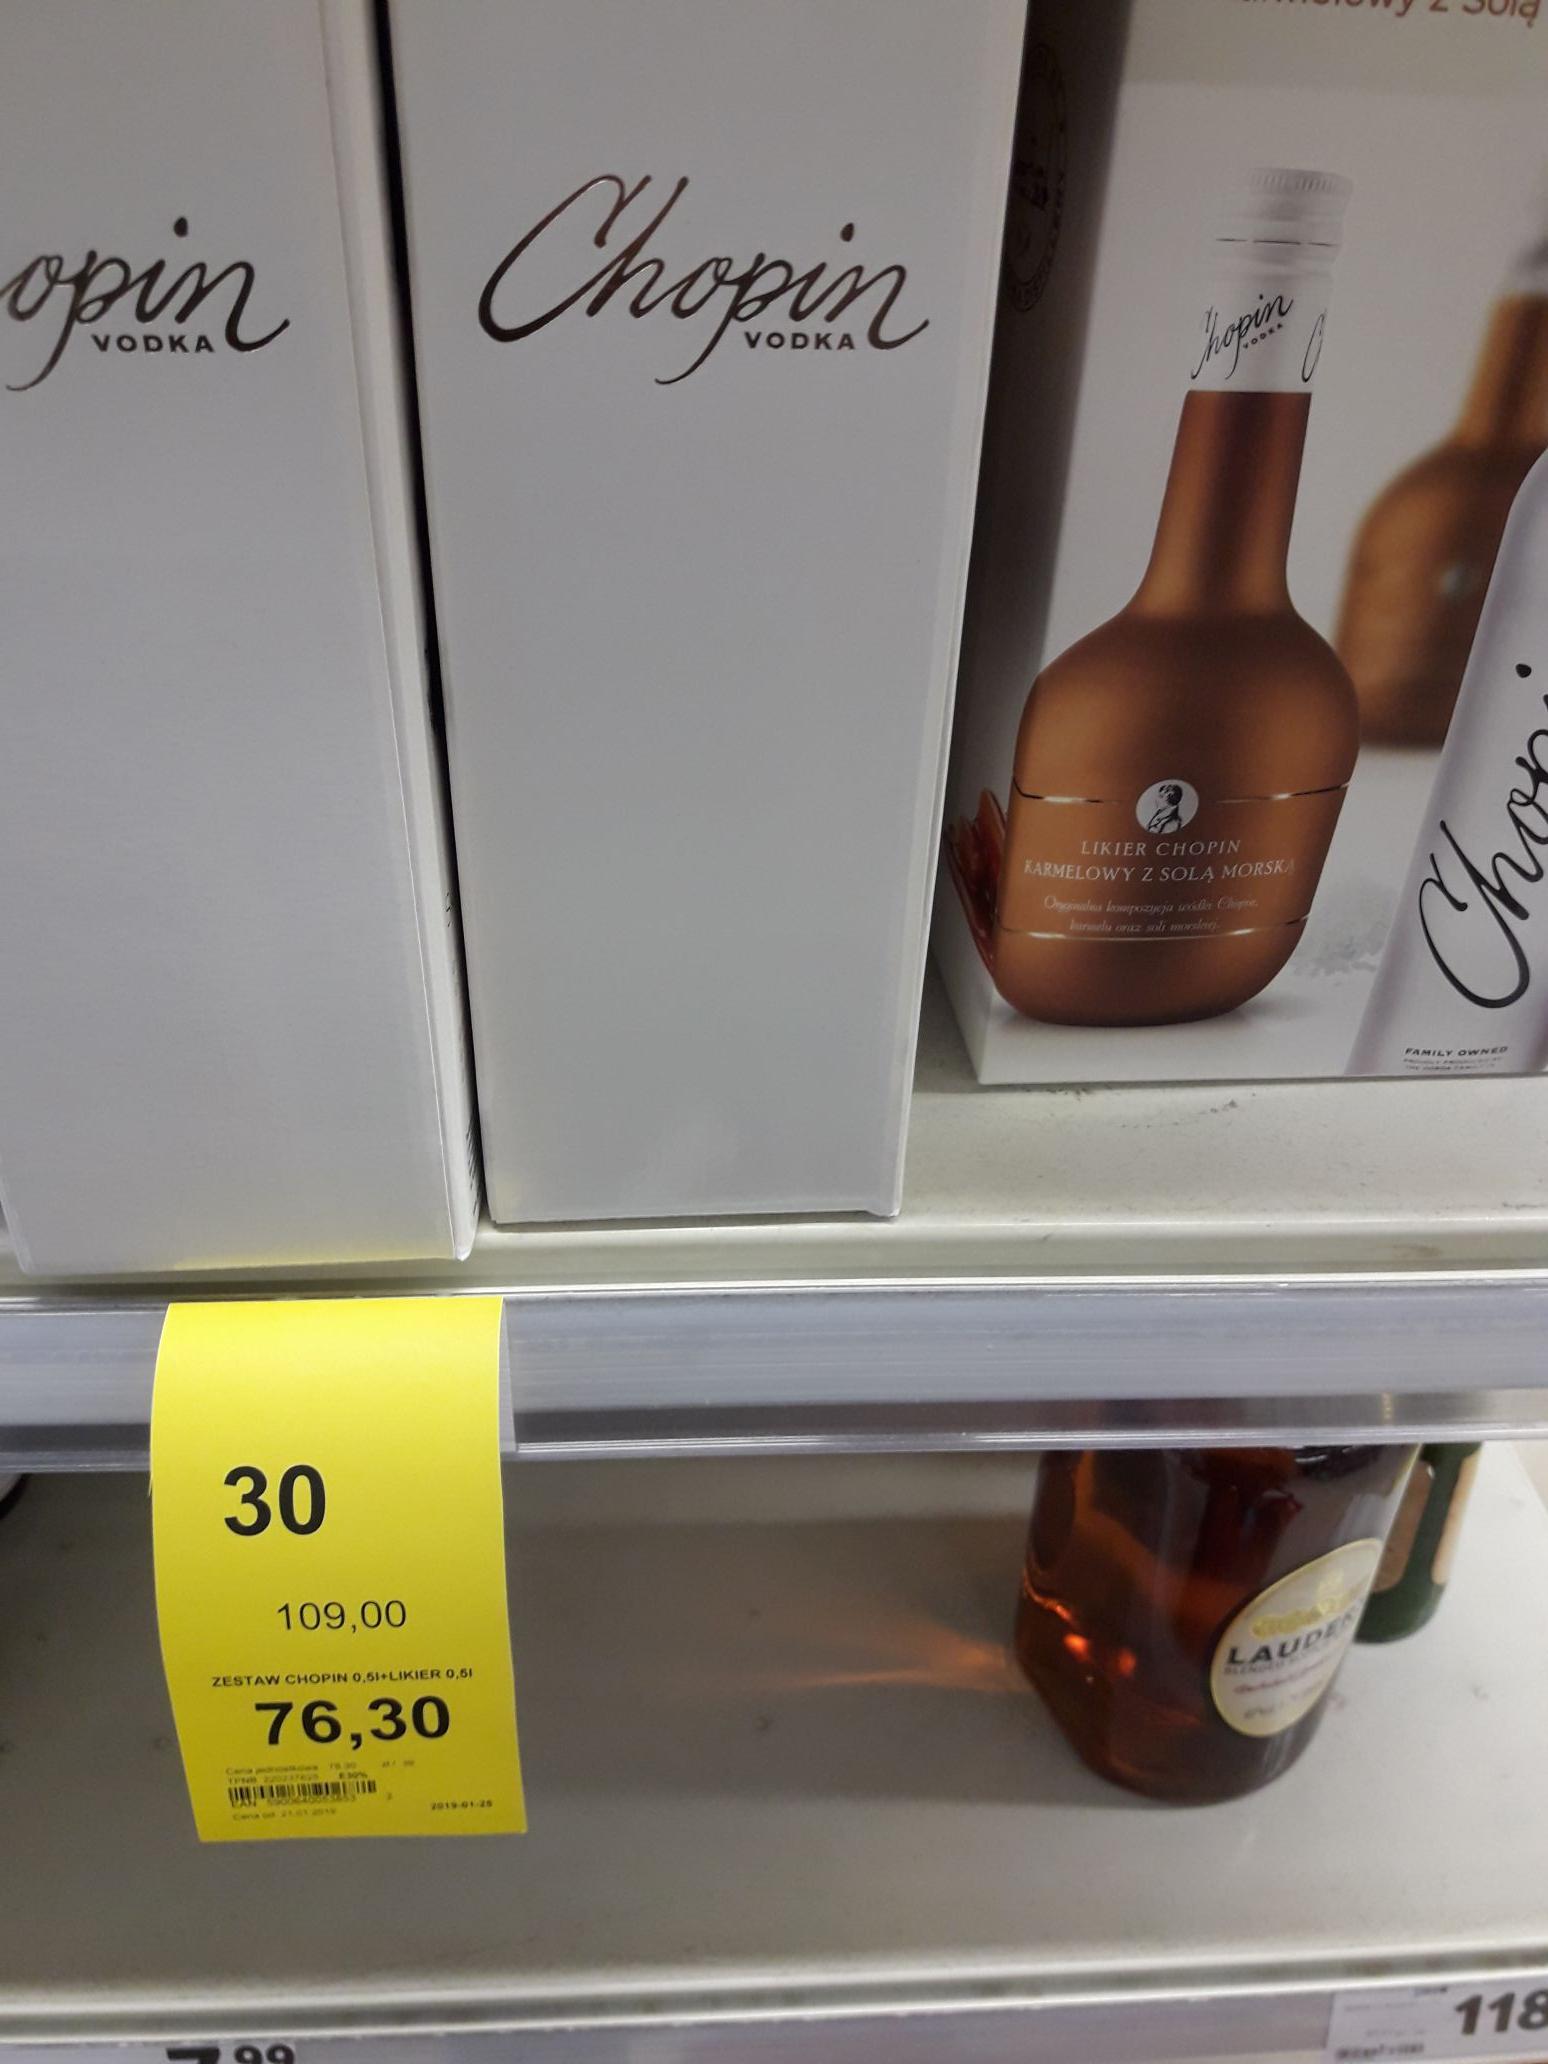 Zestaw wódka Chopin 0.5 + Likier 0.5